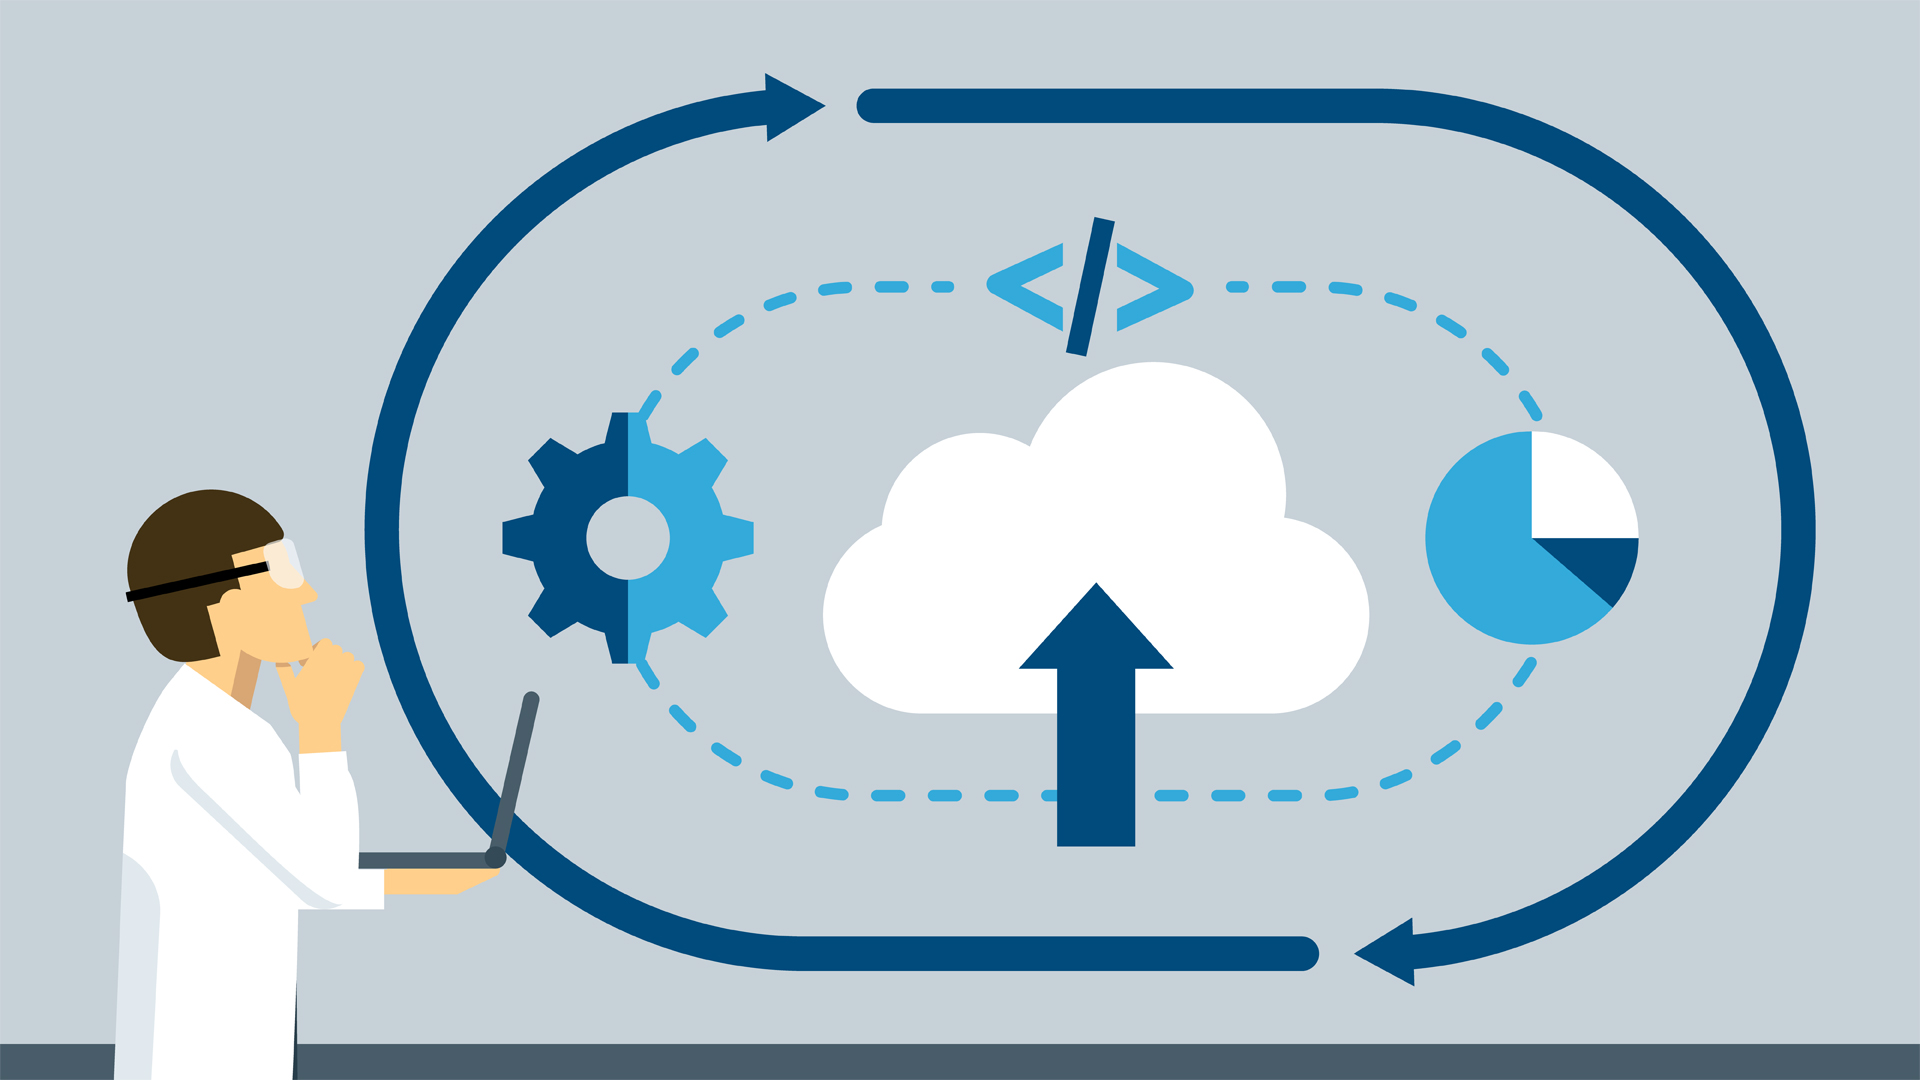 Learning Cloud Computing: Cloud Governance